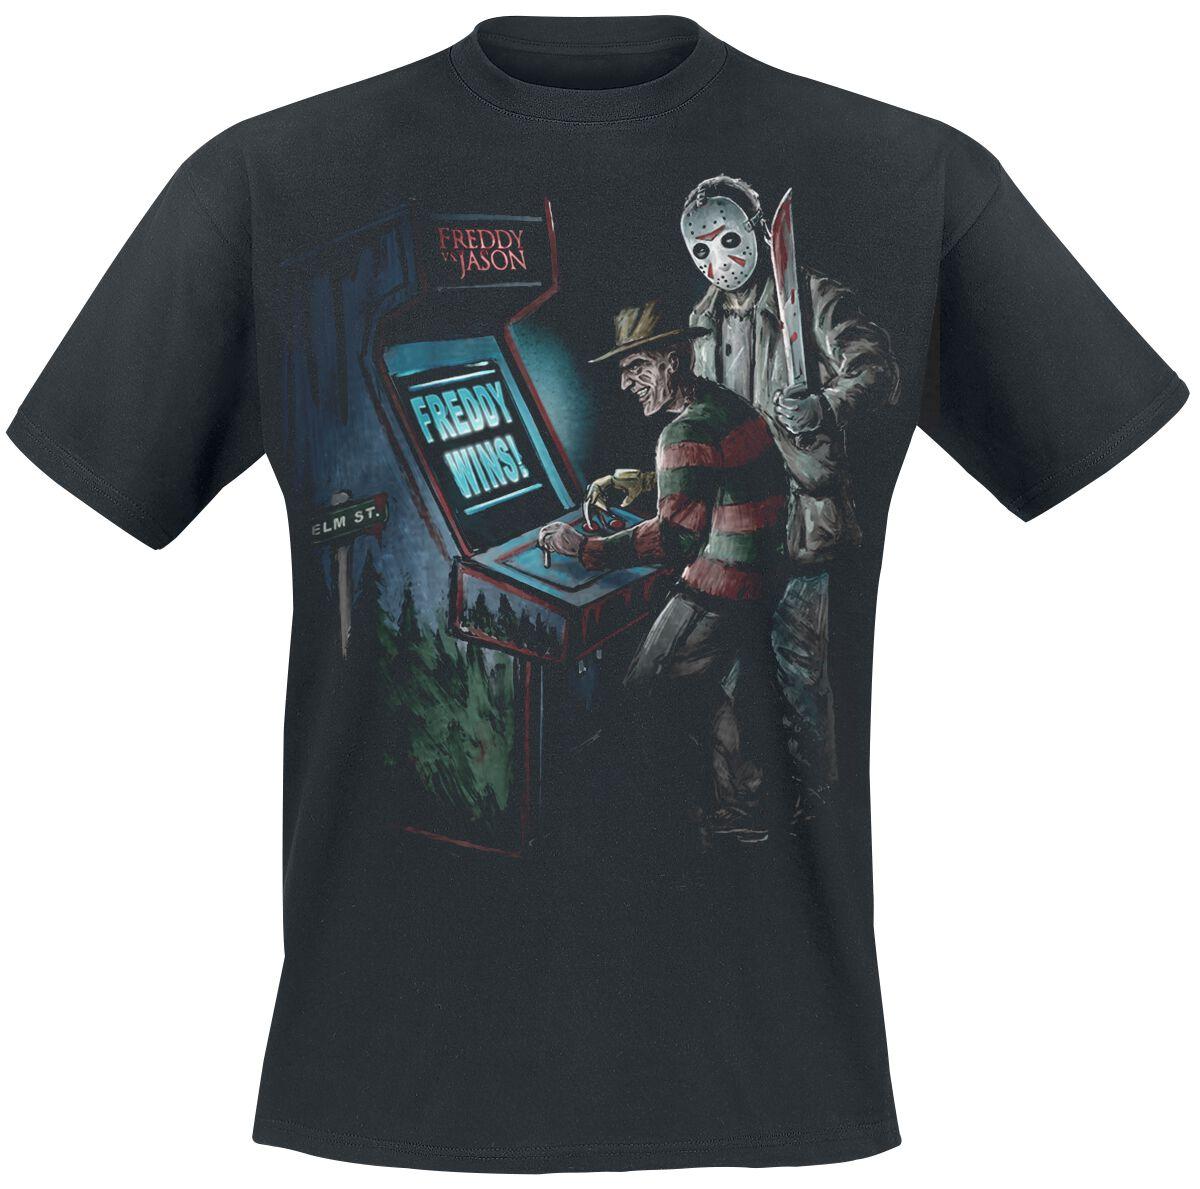 Merch dla Fanów - Koszulki - T-Shirt Freddy vs. Jason Arcade T-Shirt czarny - 377539